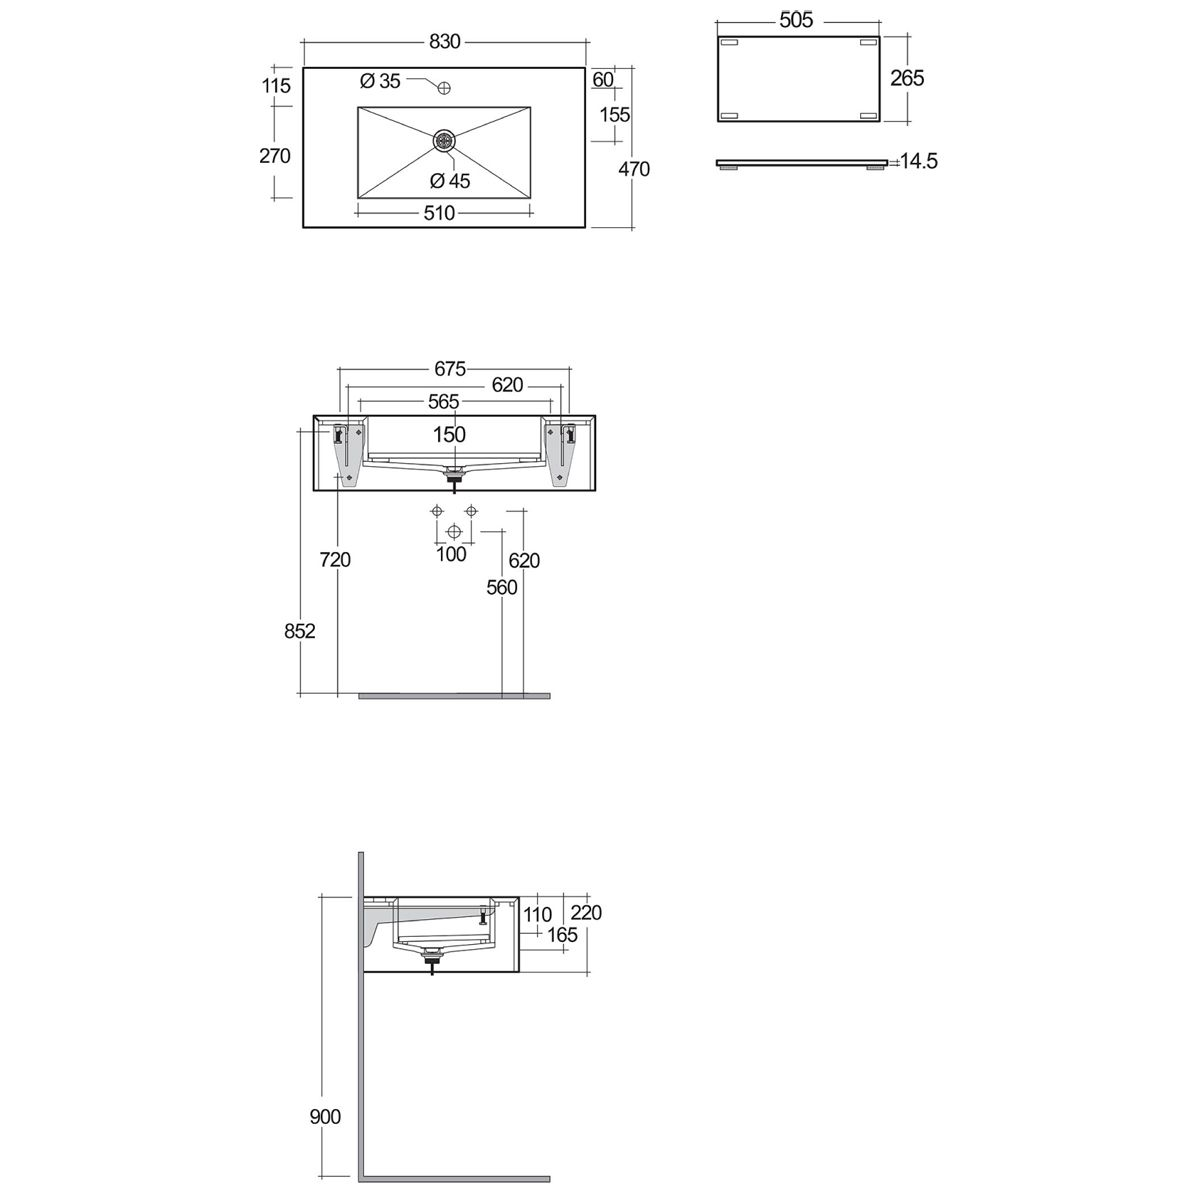 RAK Precious Behind Grey Wall Hung Counter Basin 800mm with Brackets Measurements